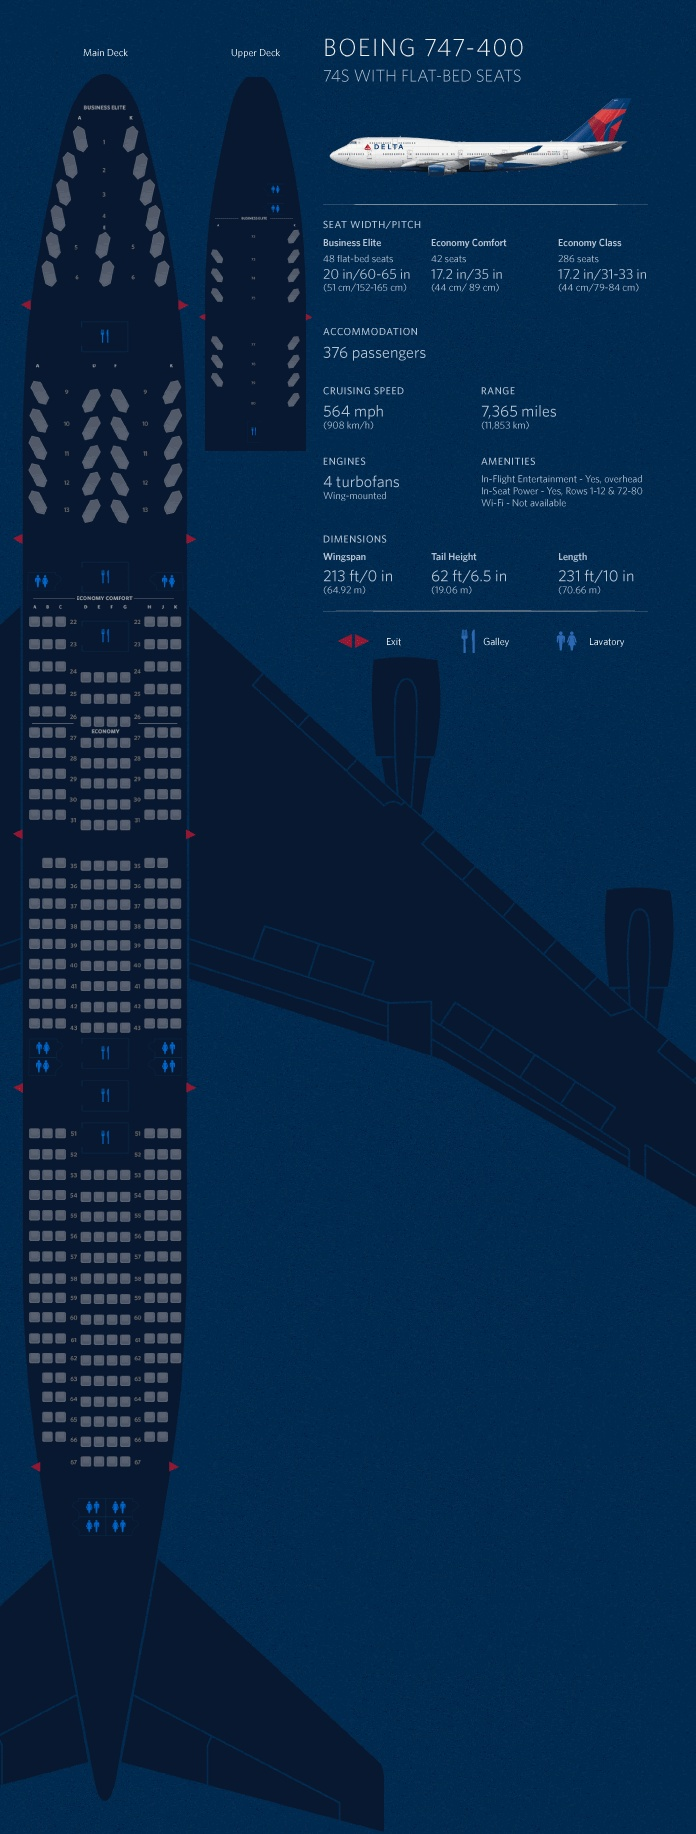 Boeing 747-400 (74S)